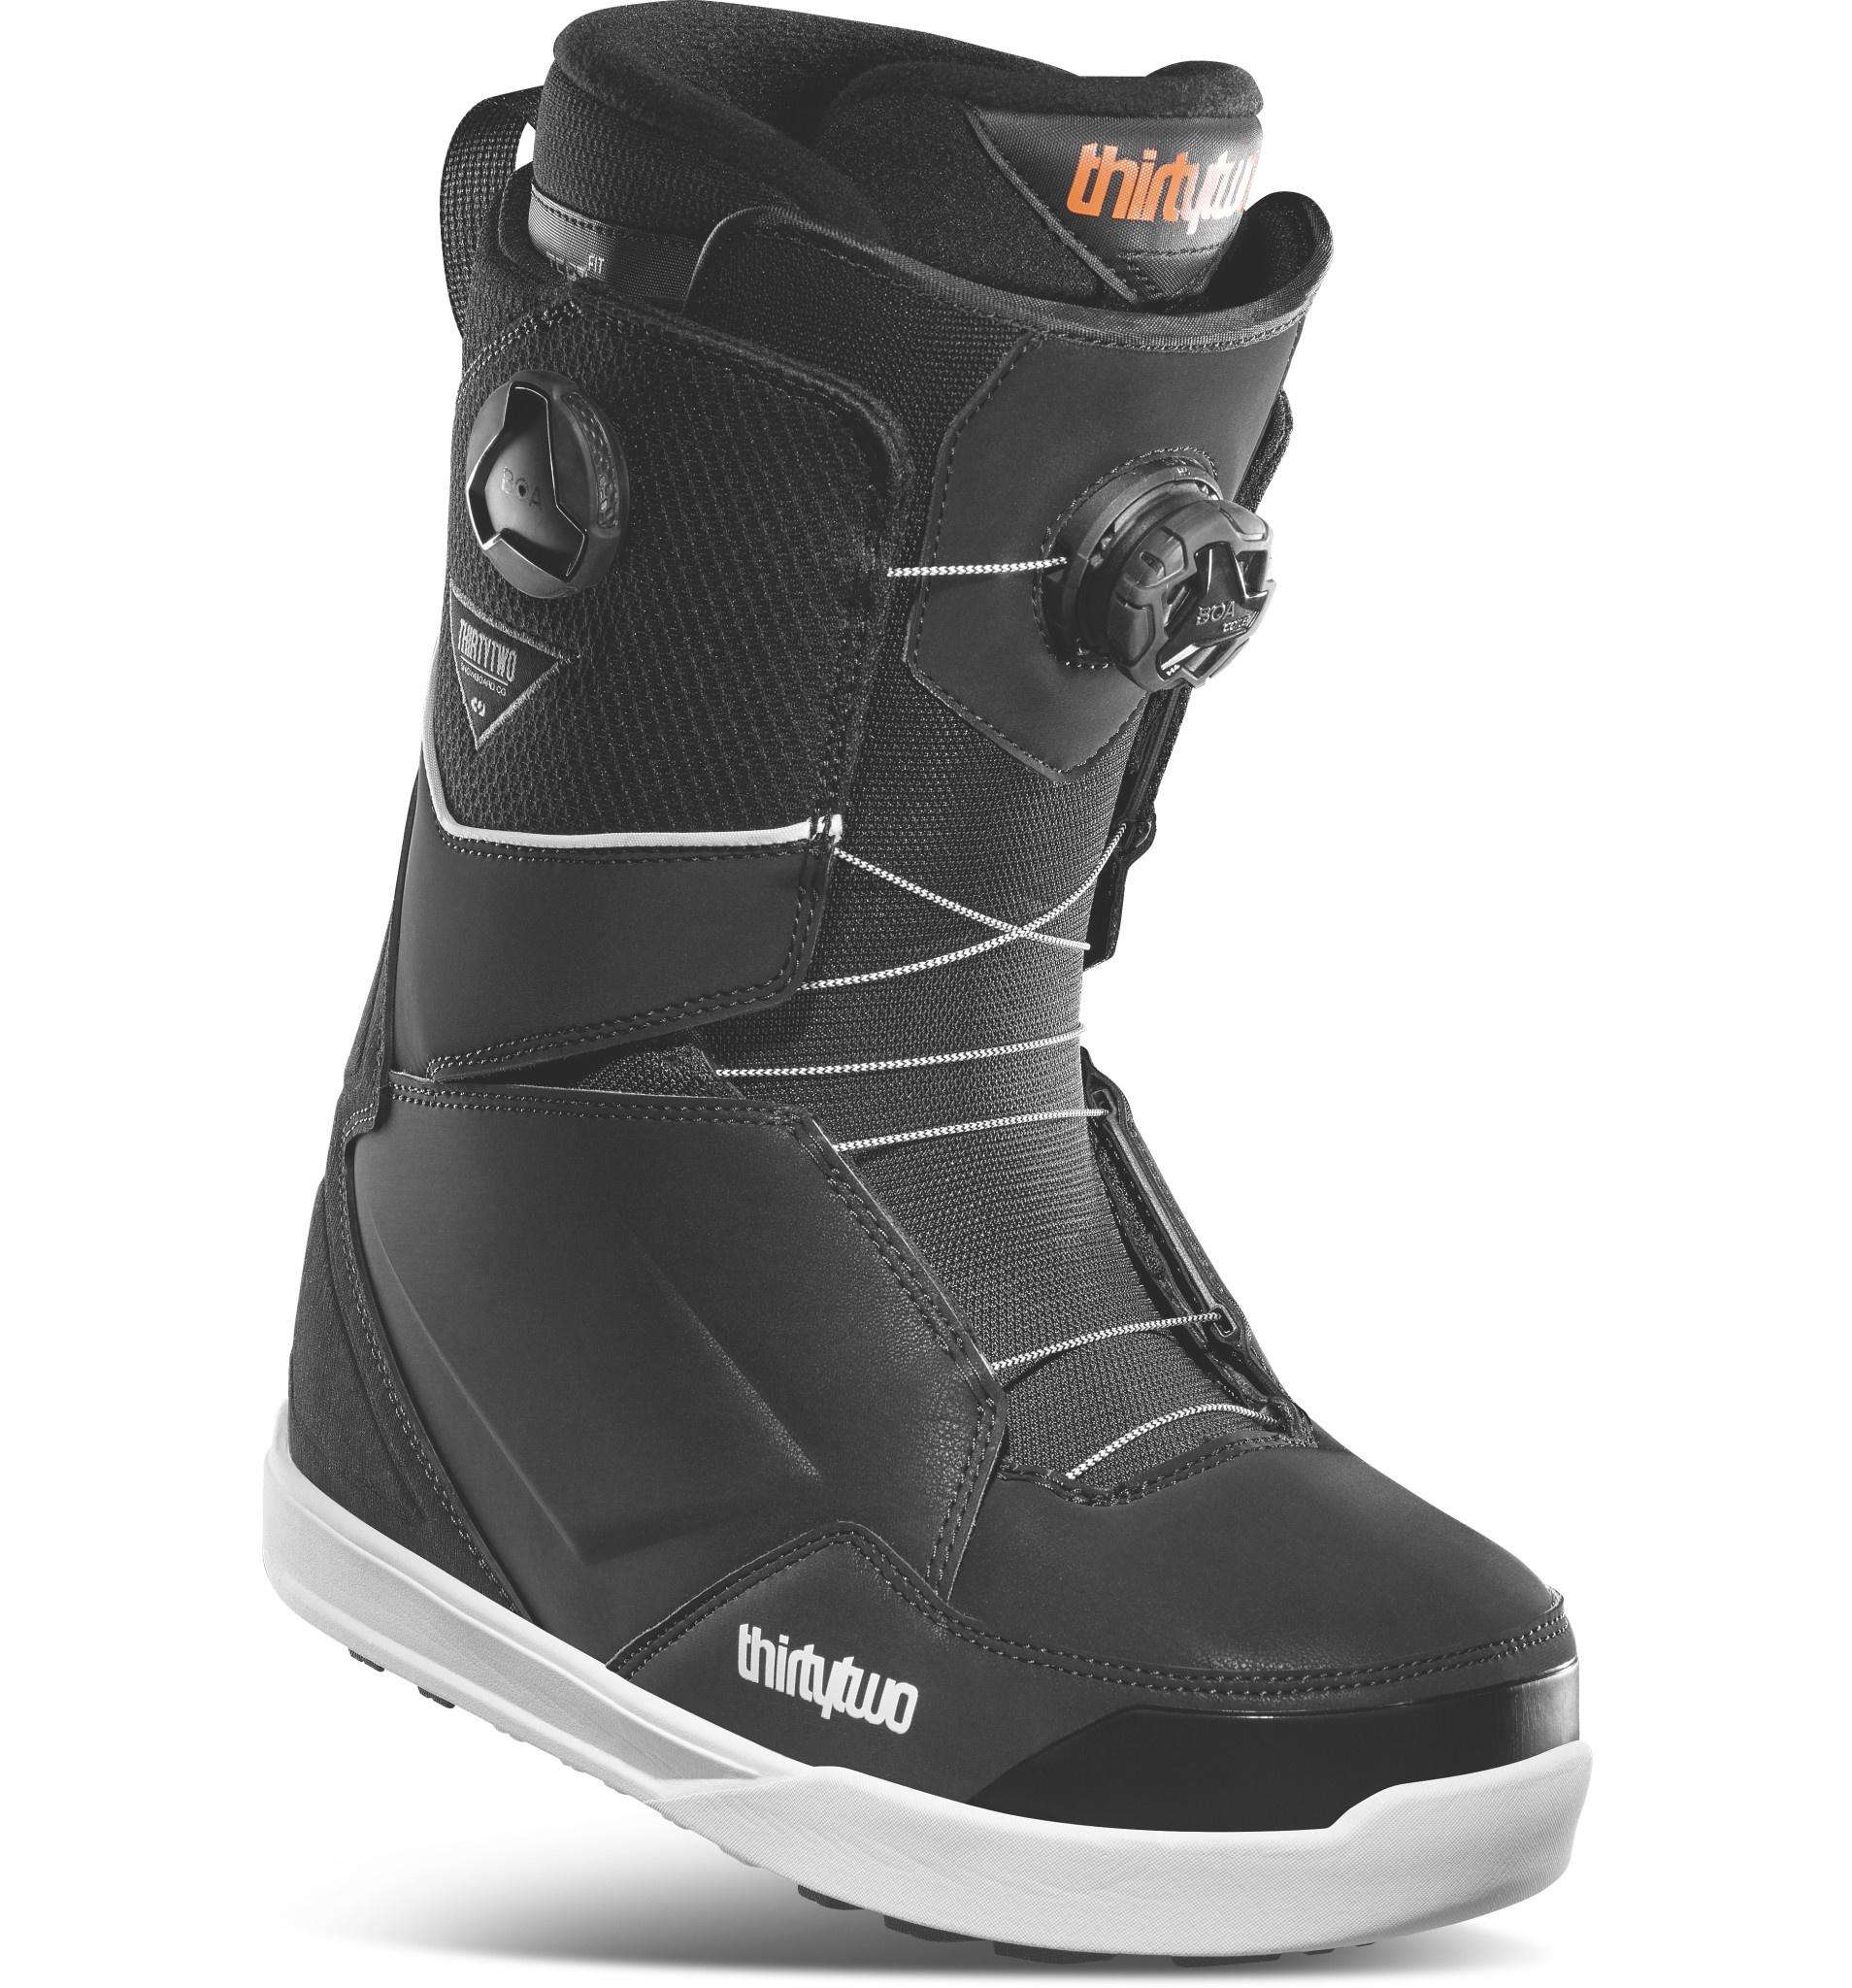 ThirtyTwo ThirtyTwo Men's Lashed Double Boa Snowboard Boot (2021)